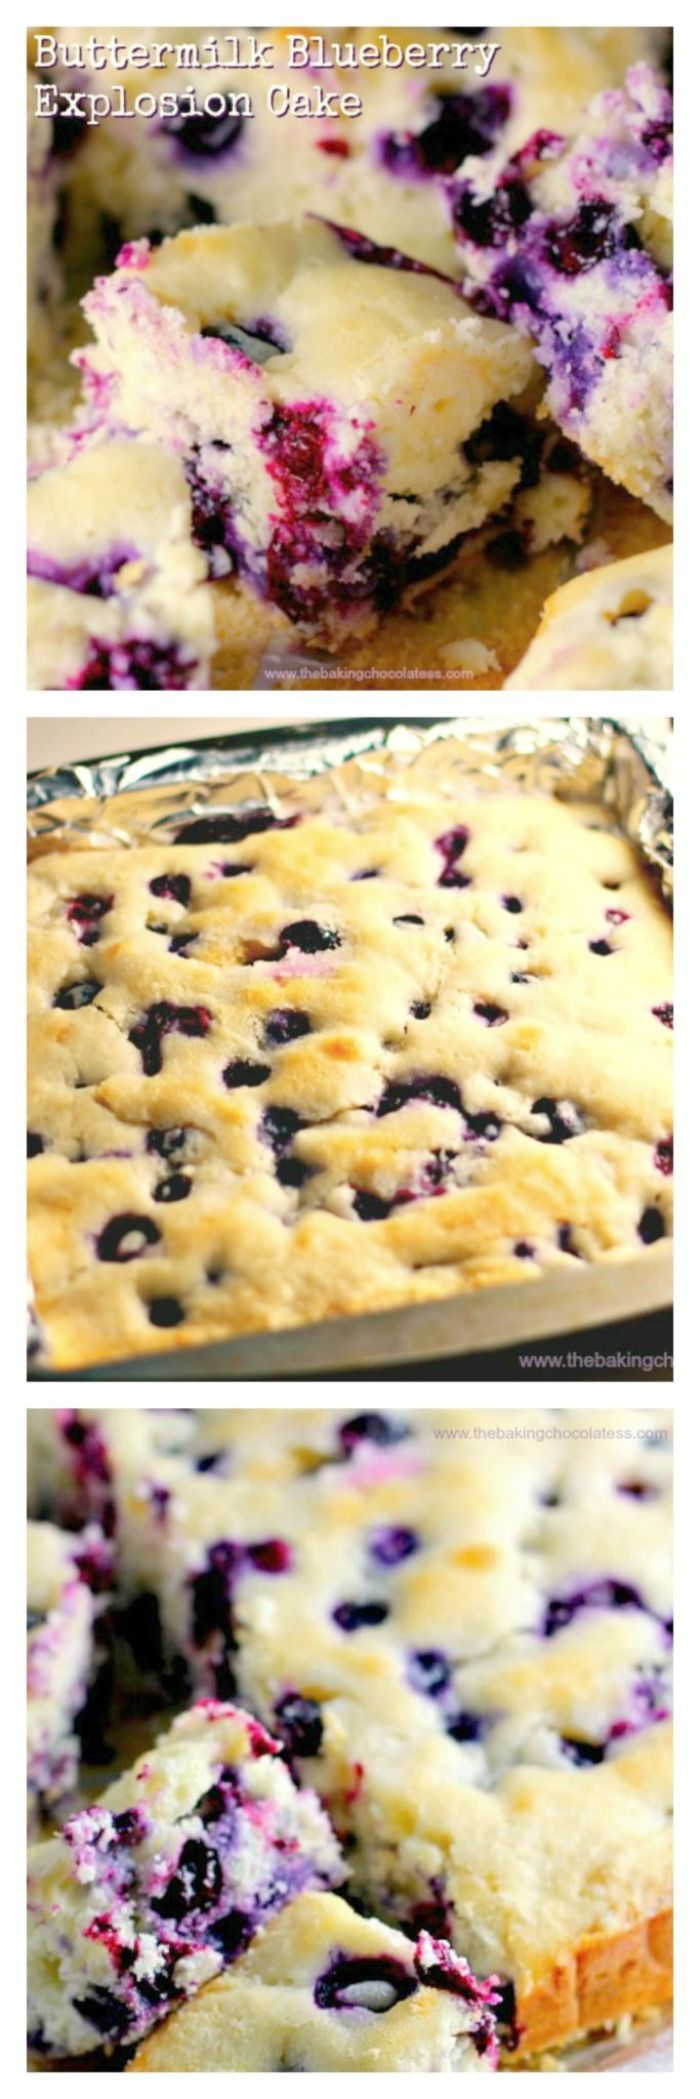 Buttermilk Blueberry Explosion Cake! via /https/://www.pinterest.com/BaknChocolaTess/